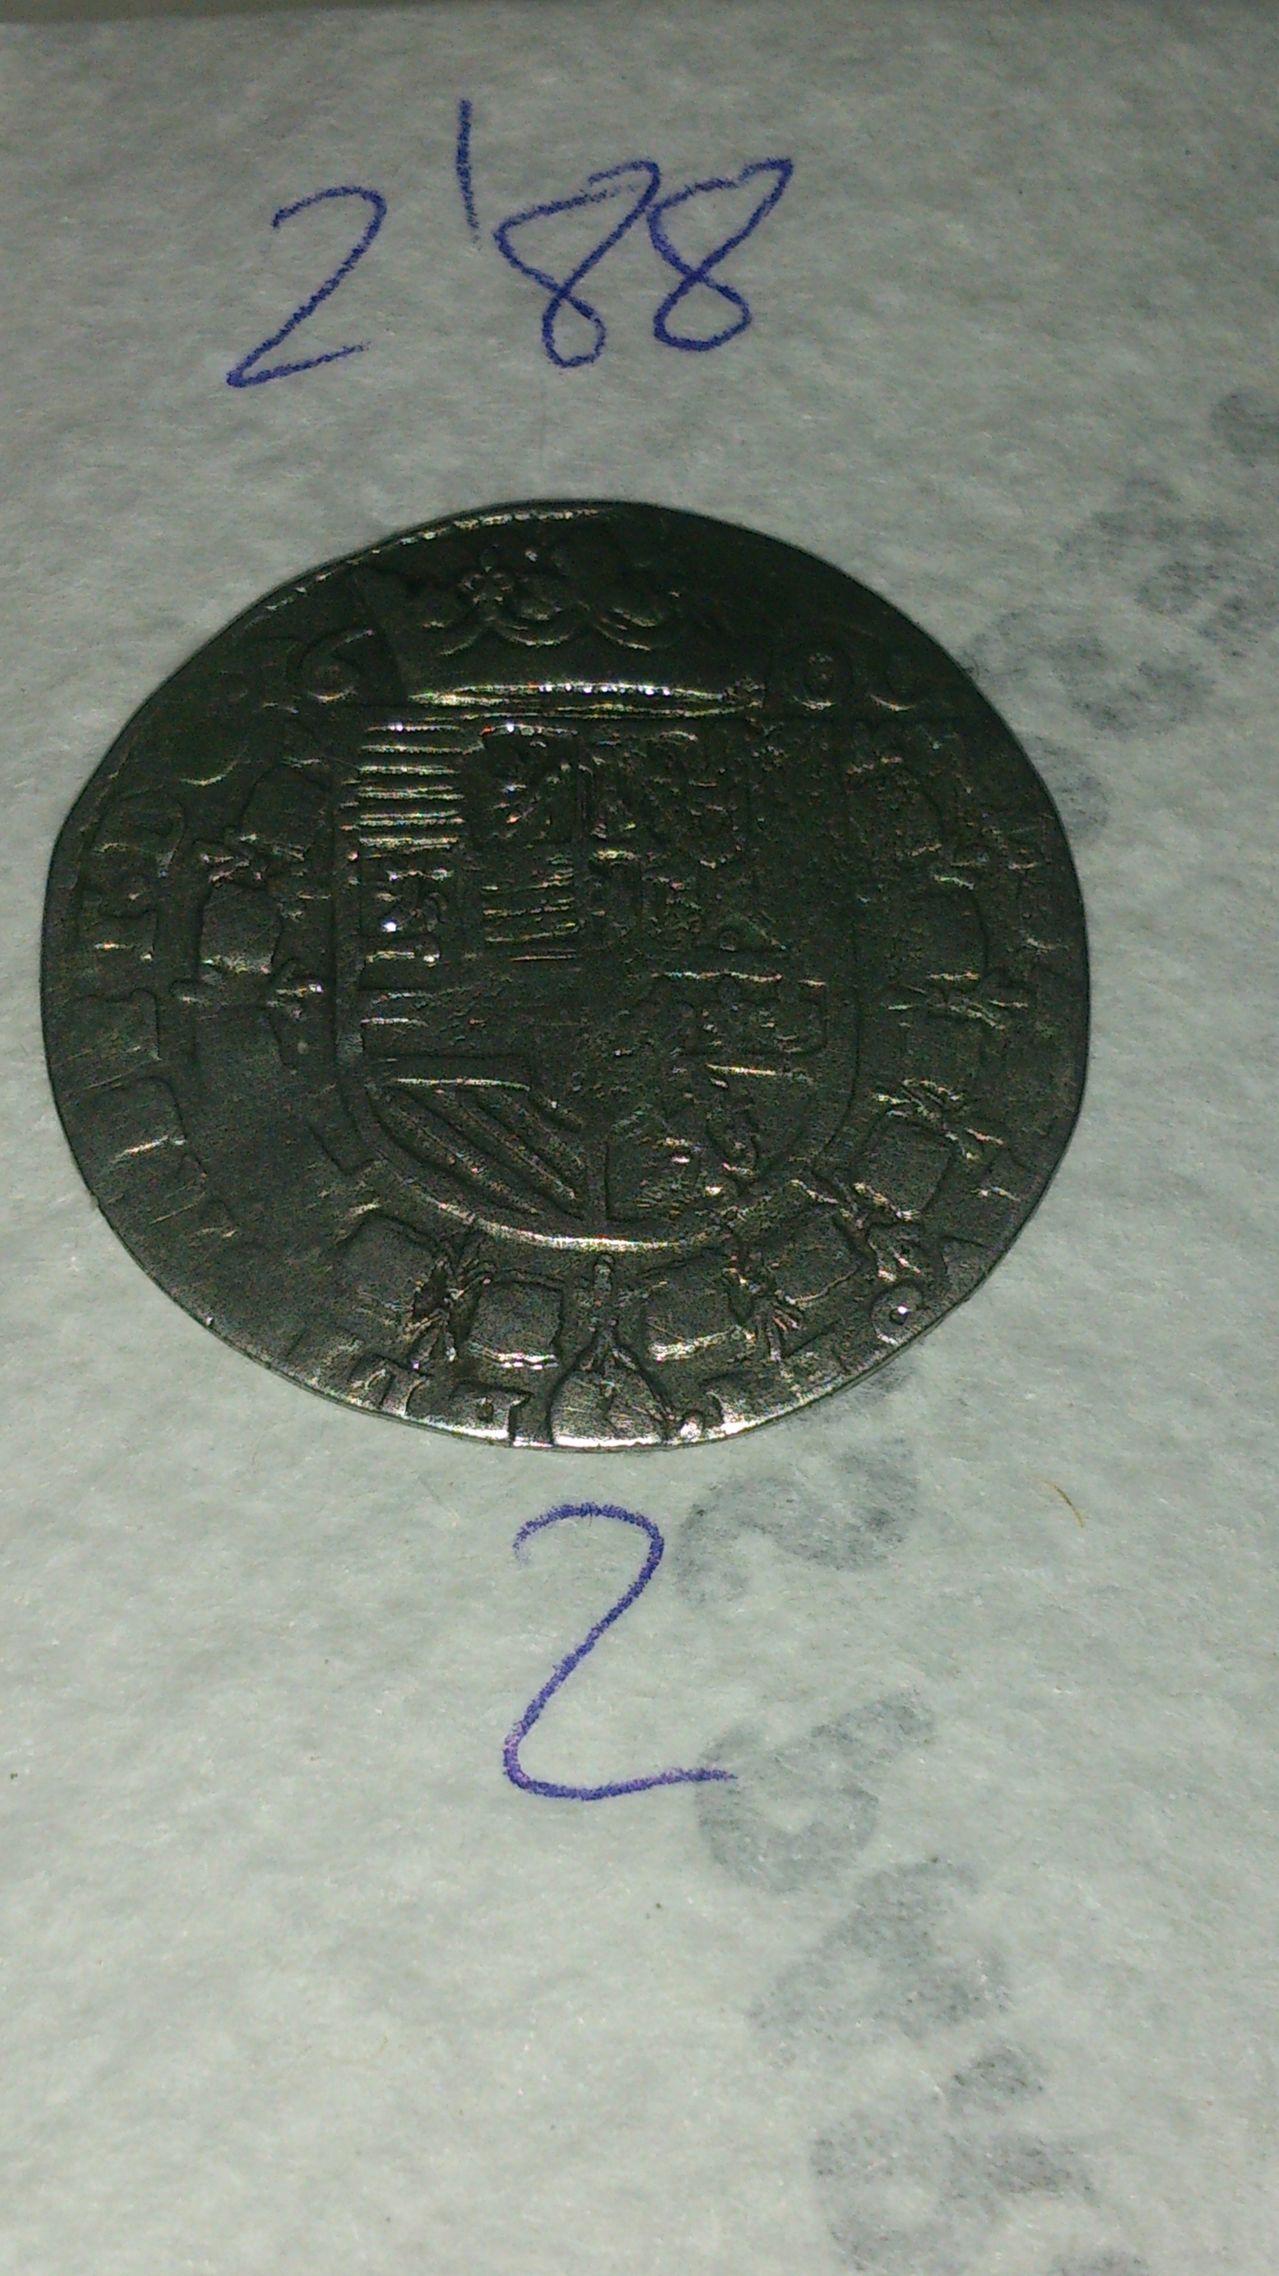 1/8 de Florín (Stoter) de los Archiduques Alberto e Isabel, Amberes. 1600. DSC_0114